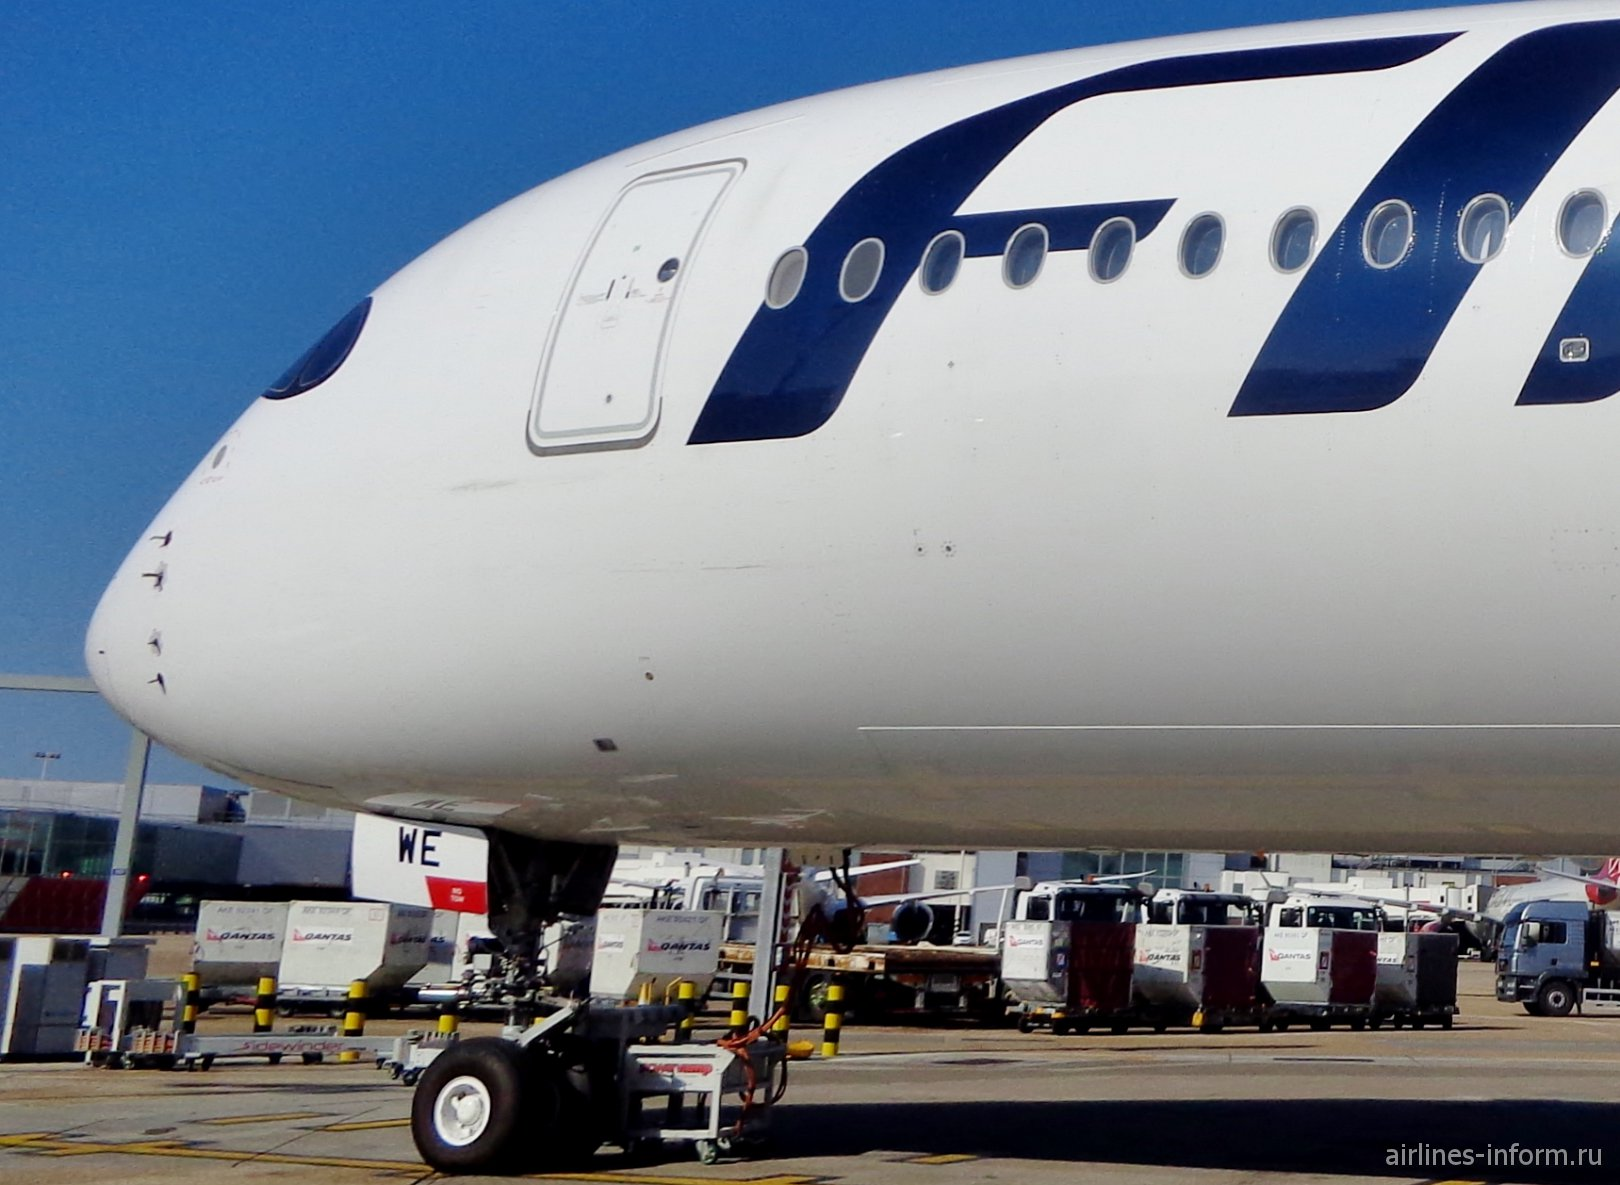 Хельсинки-Лондон (HEL-LHR). Знакомство с Аirbus A350 Finnair + Concorde British Airways